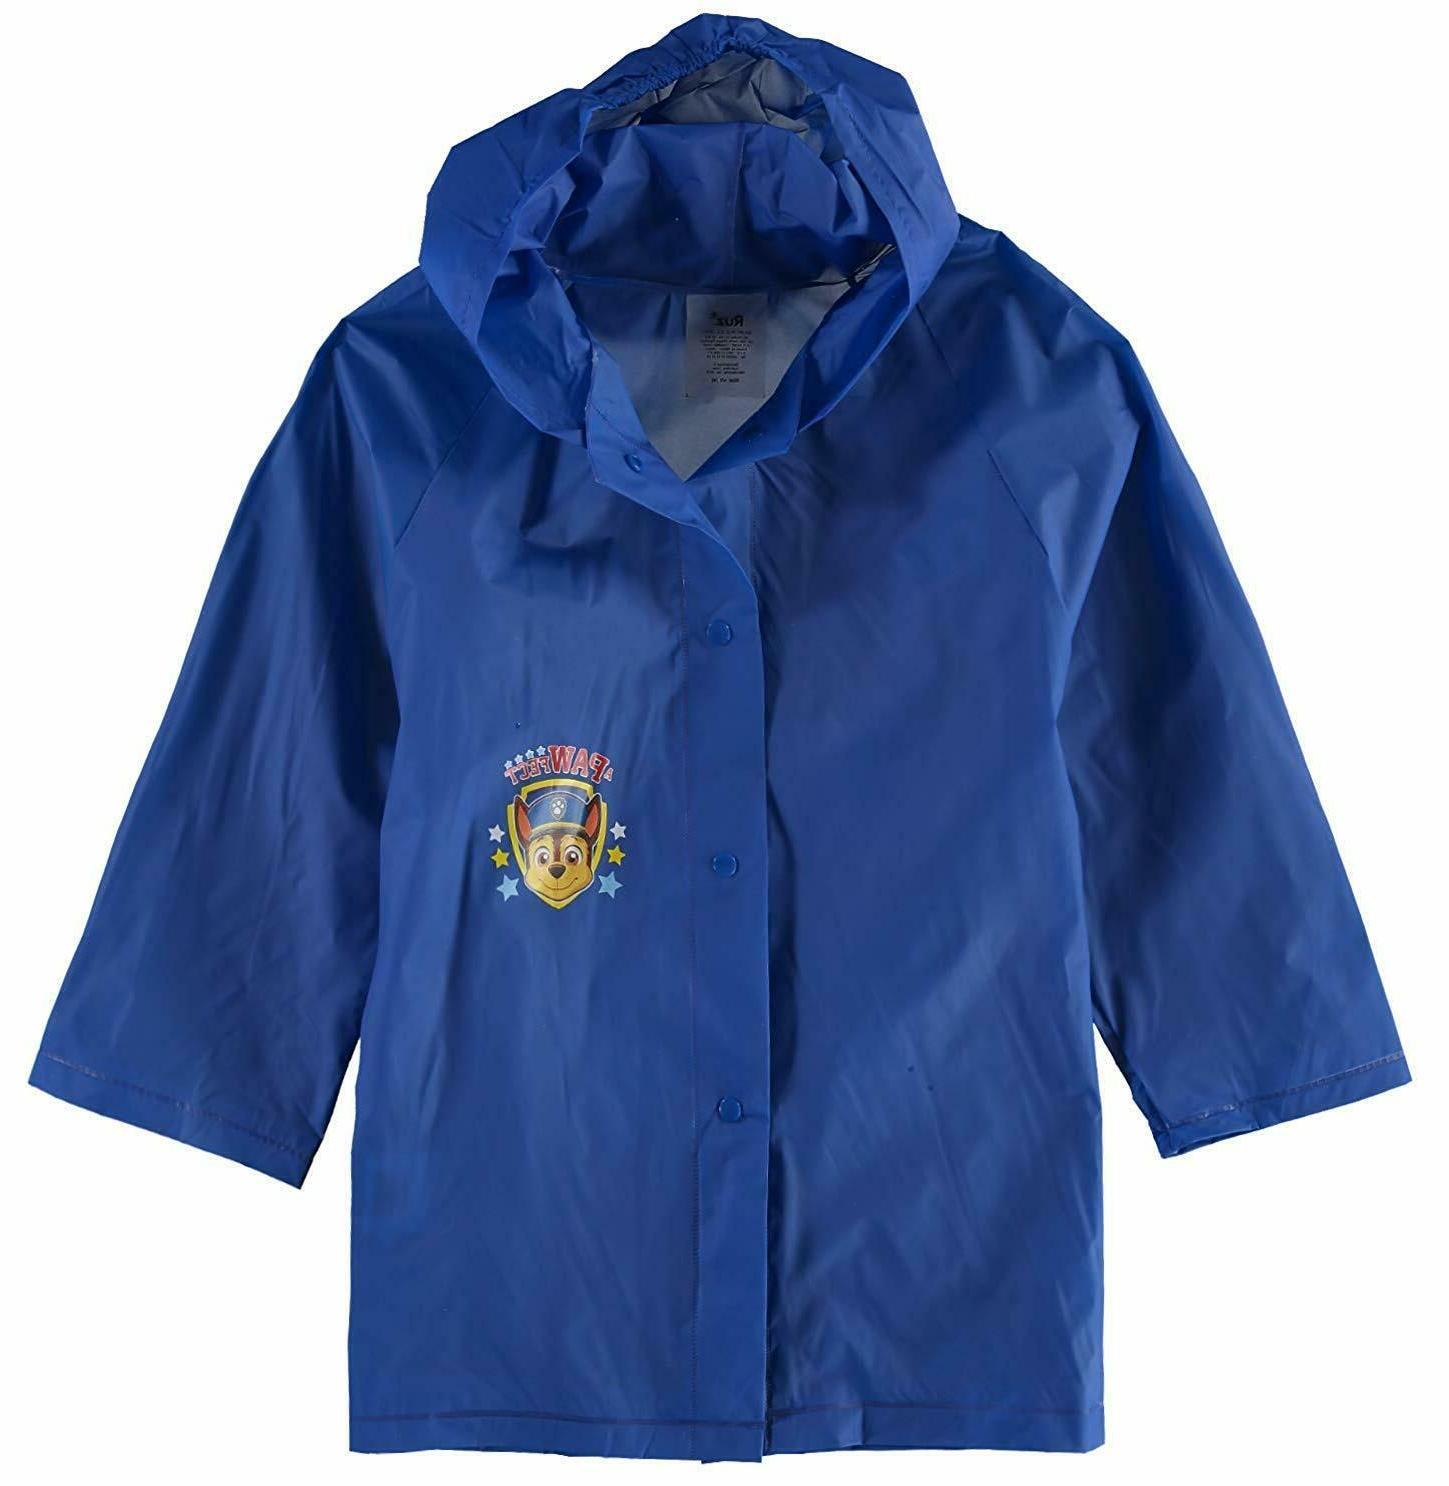 Paw Hooded Size Coat